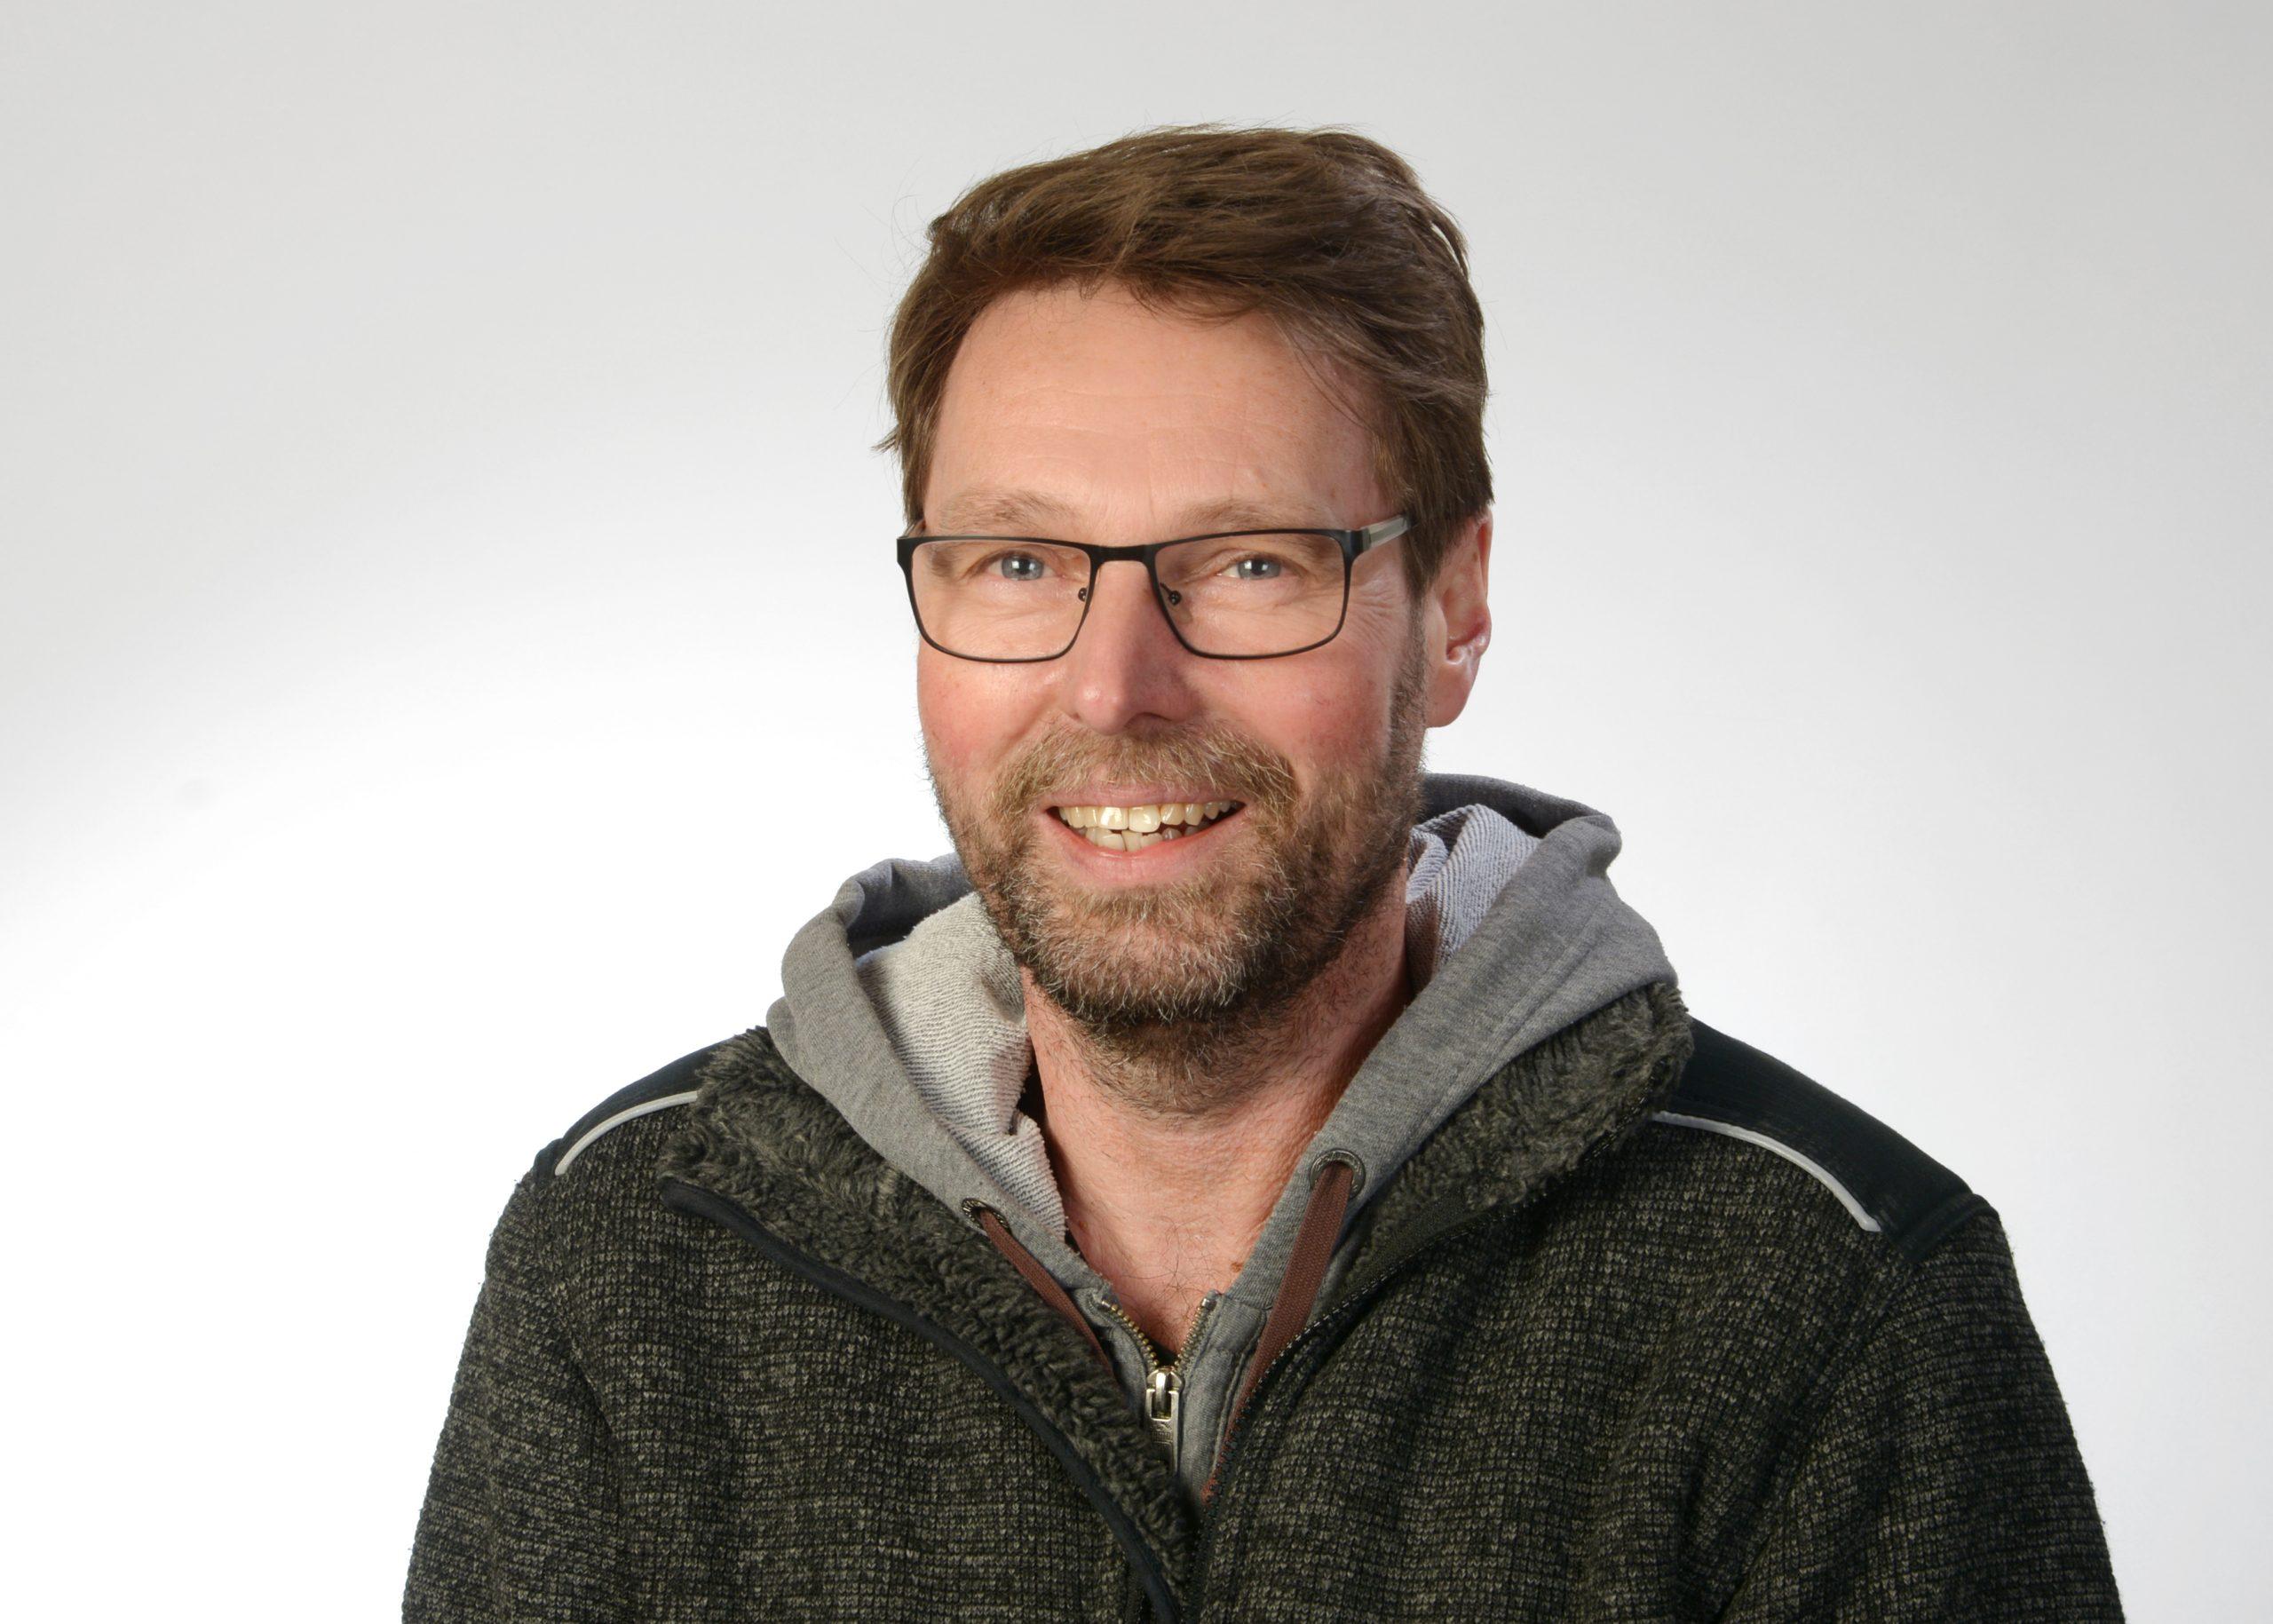 Olaf Möller